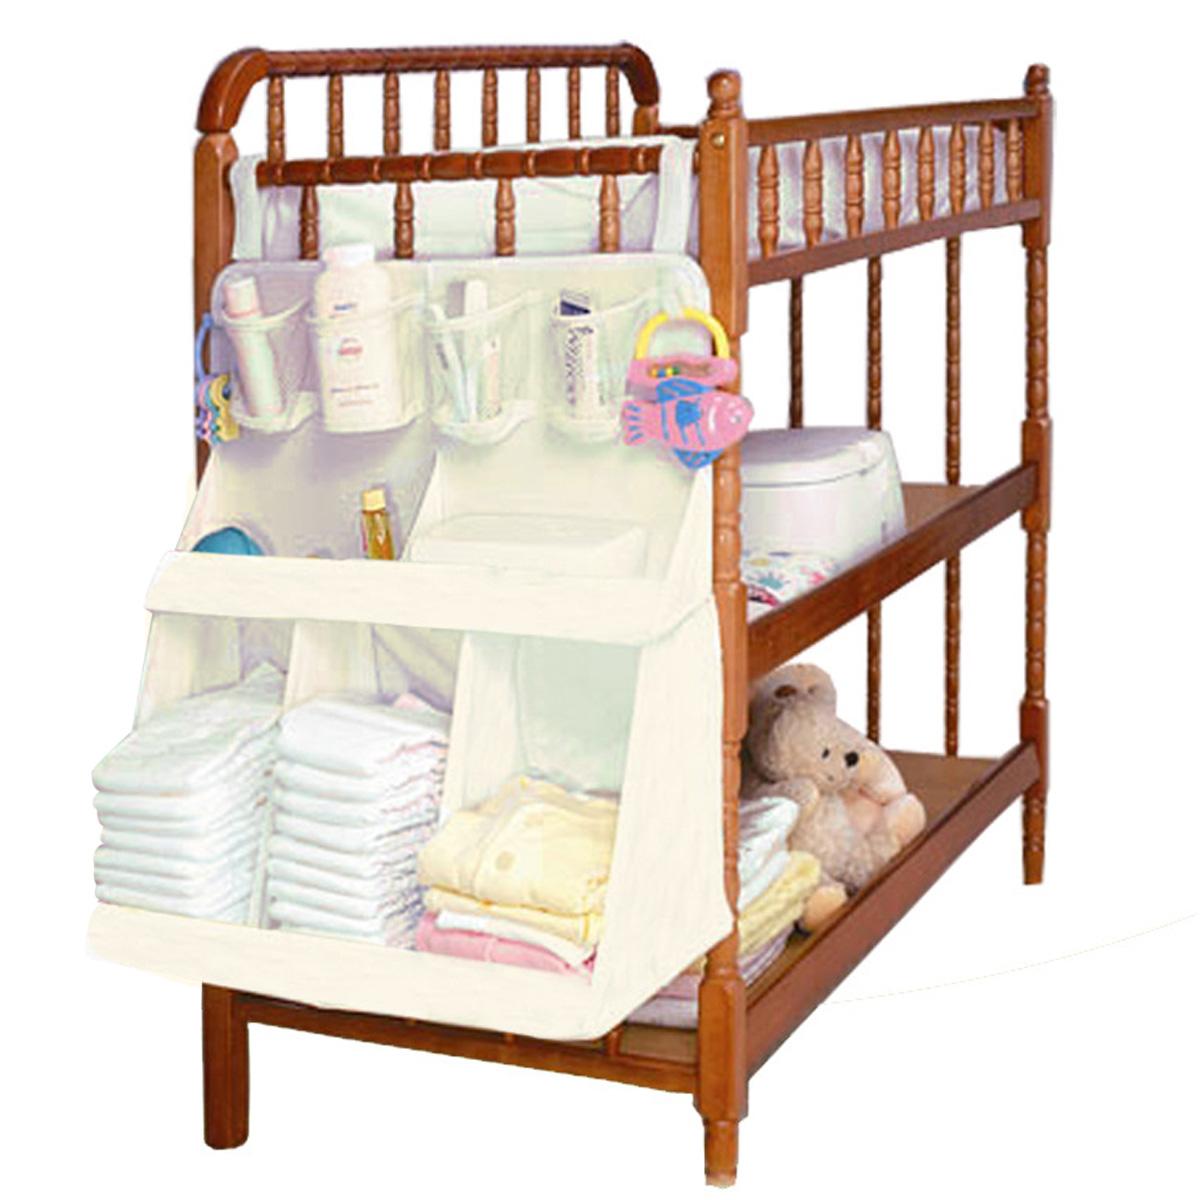 Baby Bedding Set Accessories Waterproof Diapers Organizer Baby Crib Bed Hanging Bag Portable Storage Bag(China (Mainland))